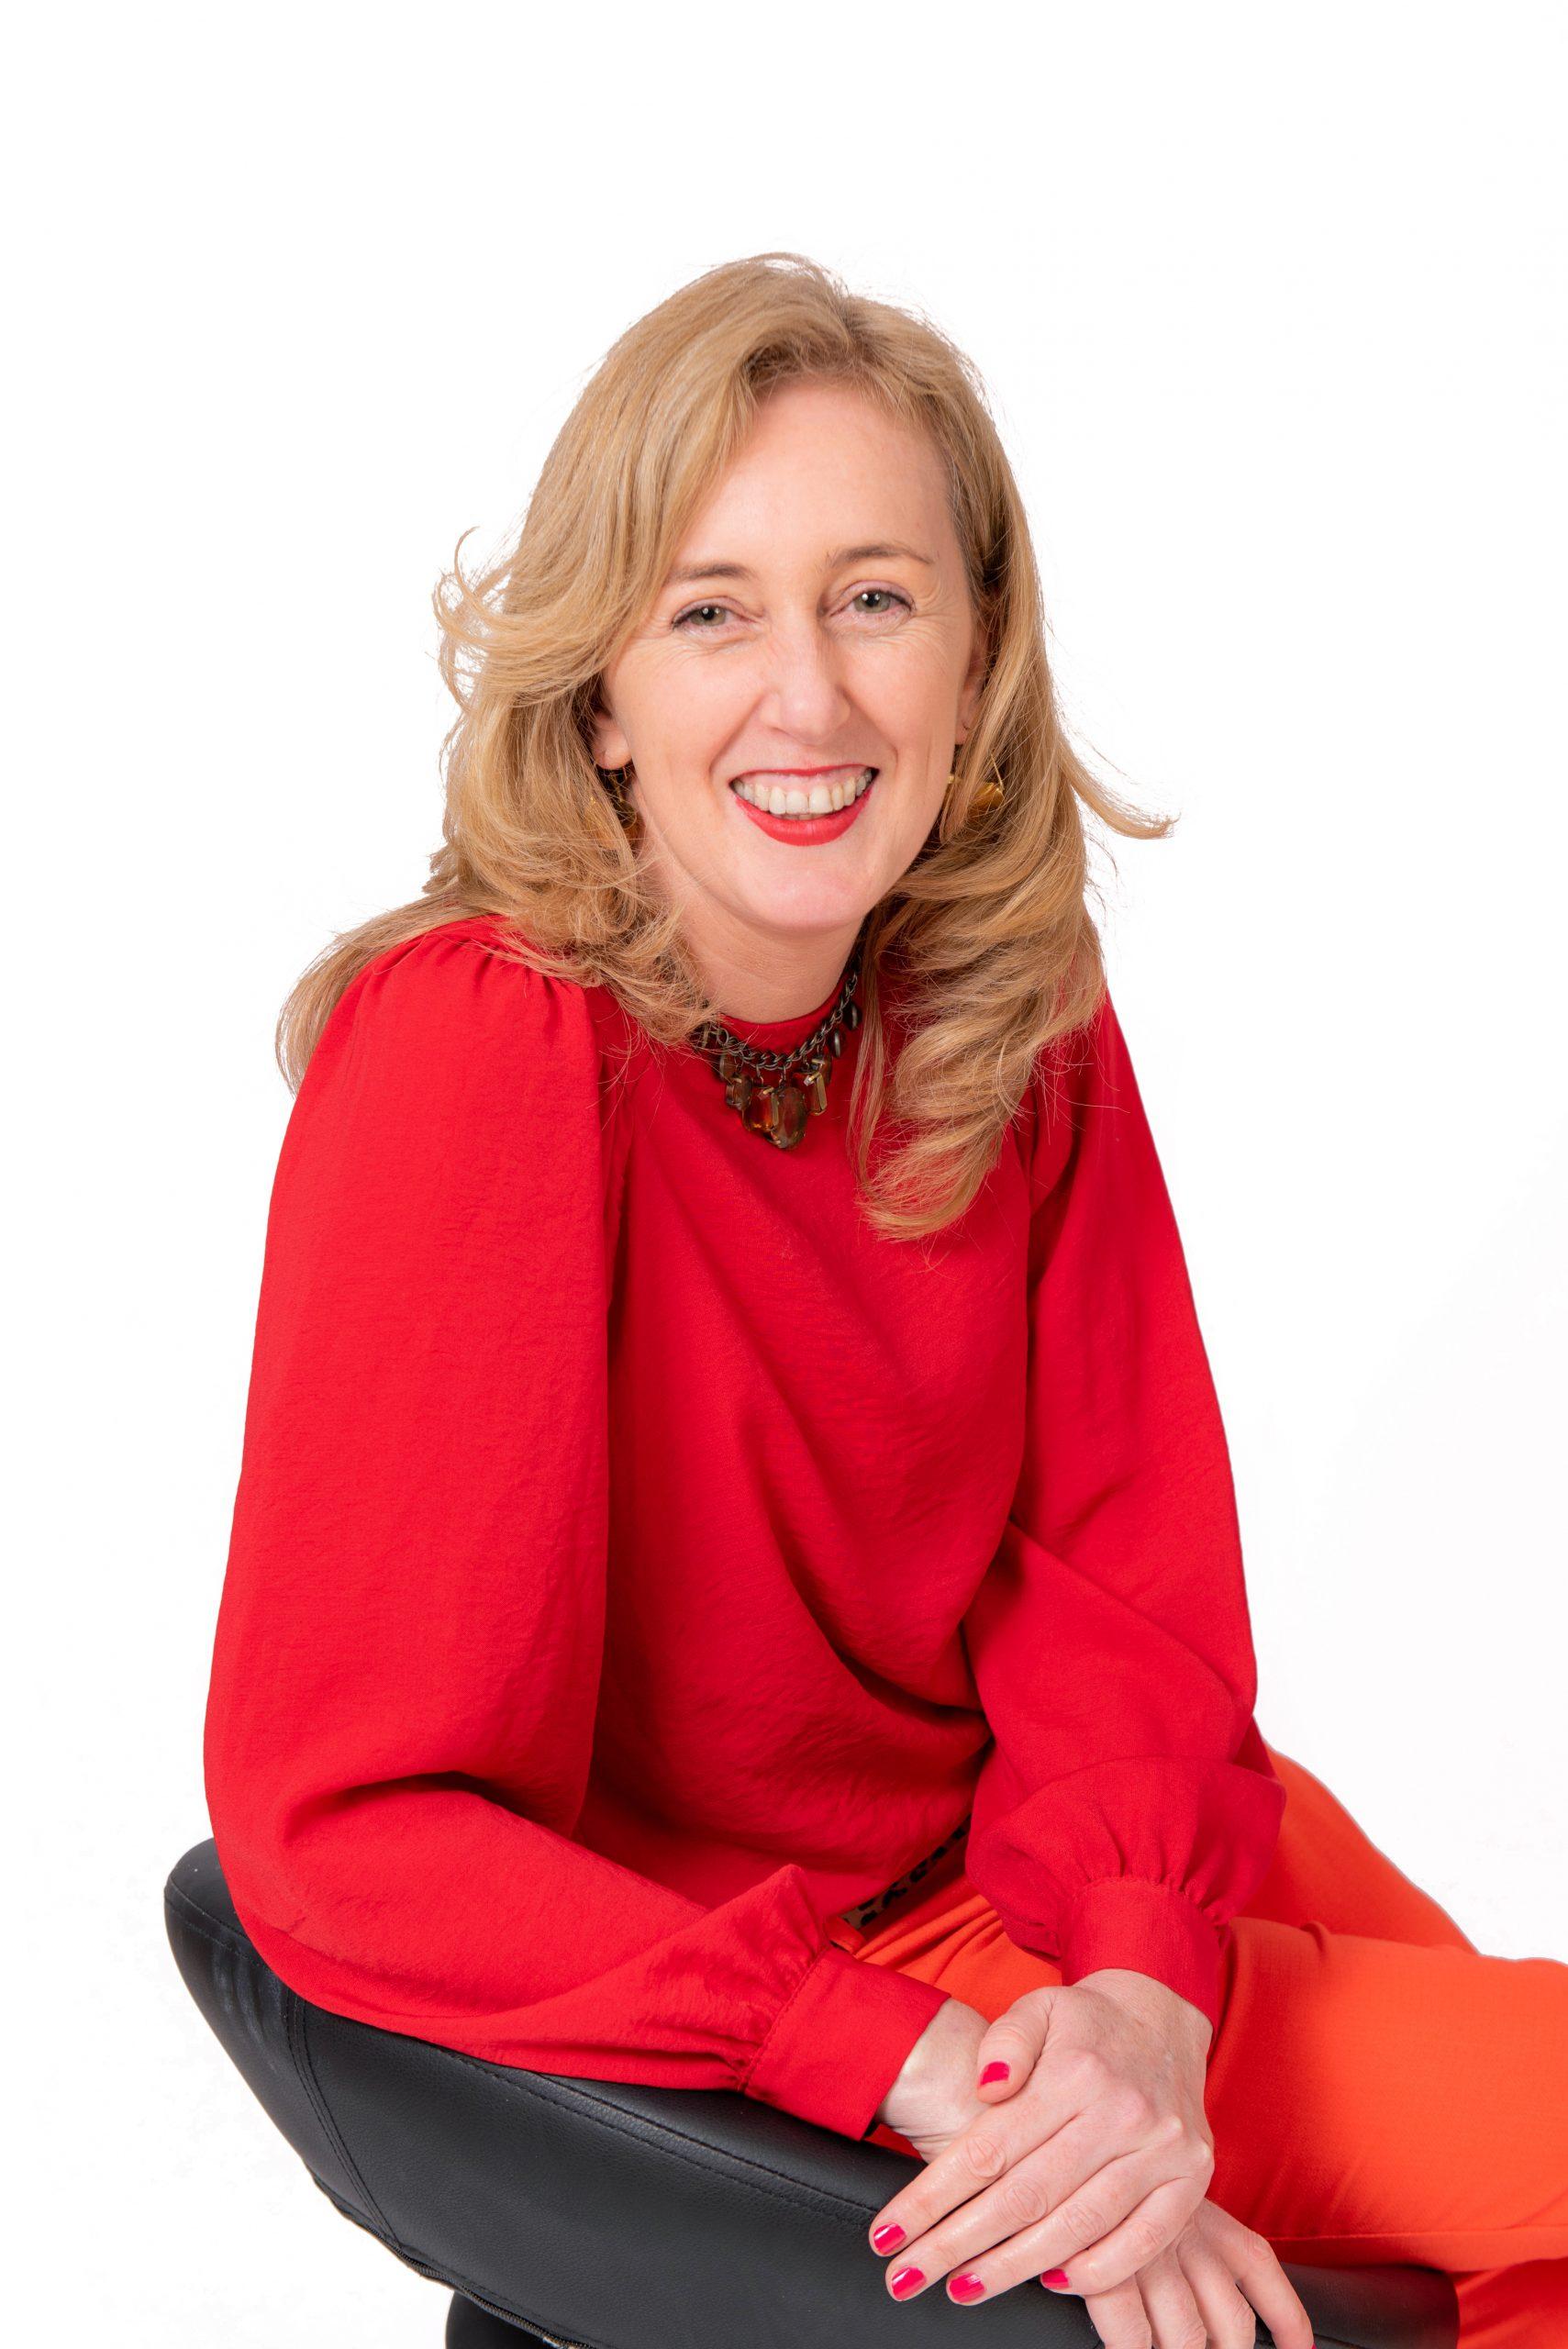 Image of Kath Harlow